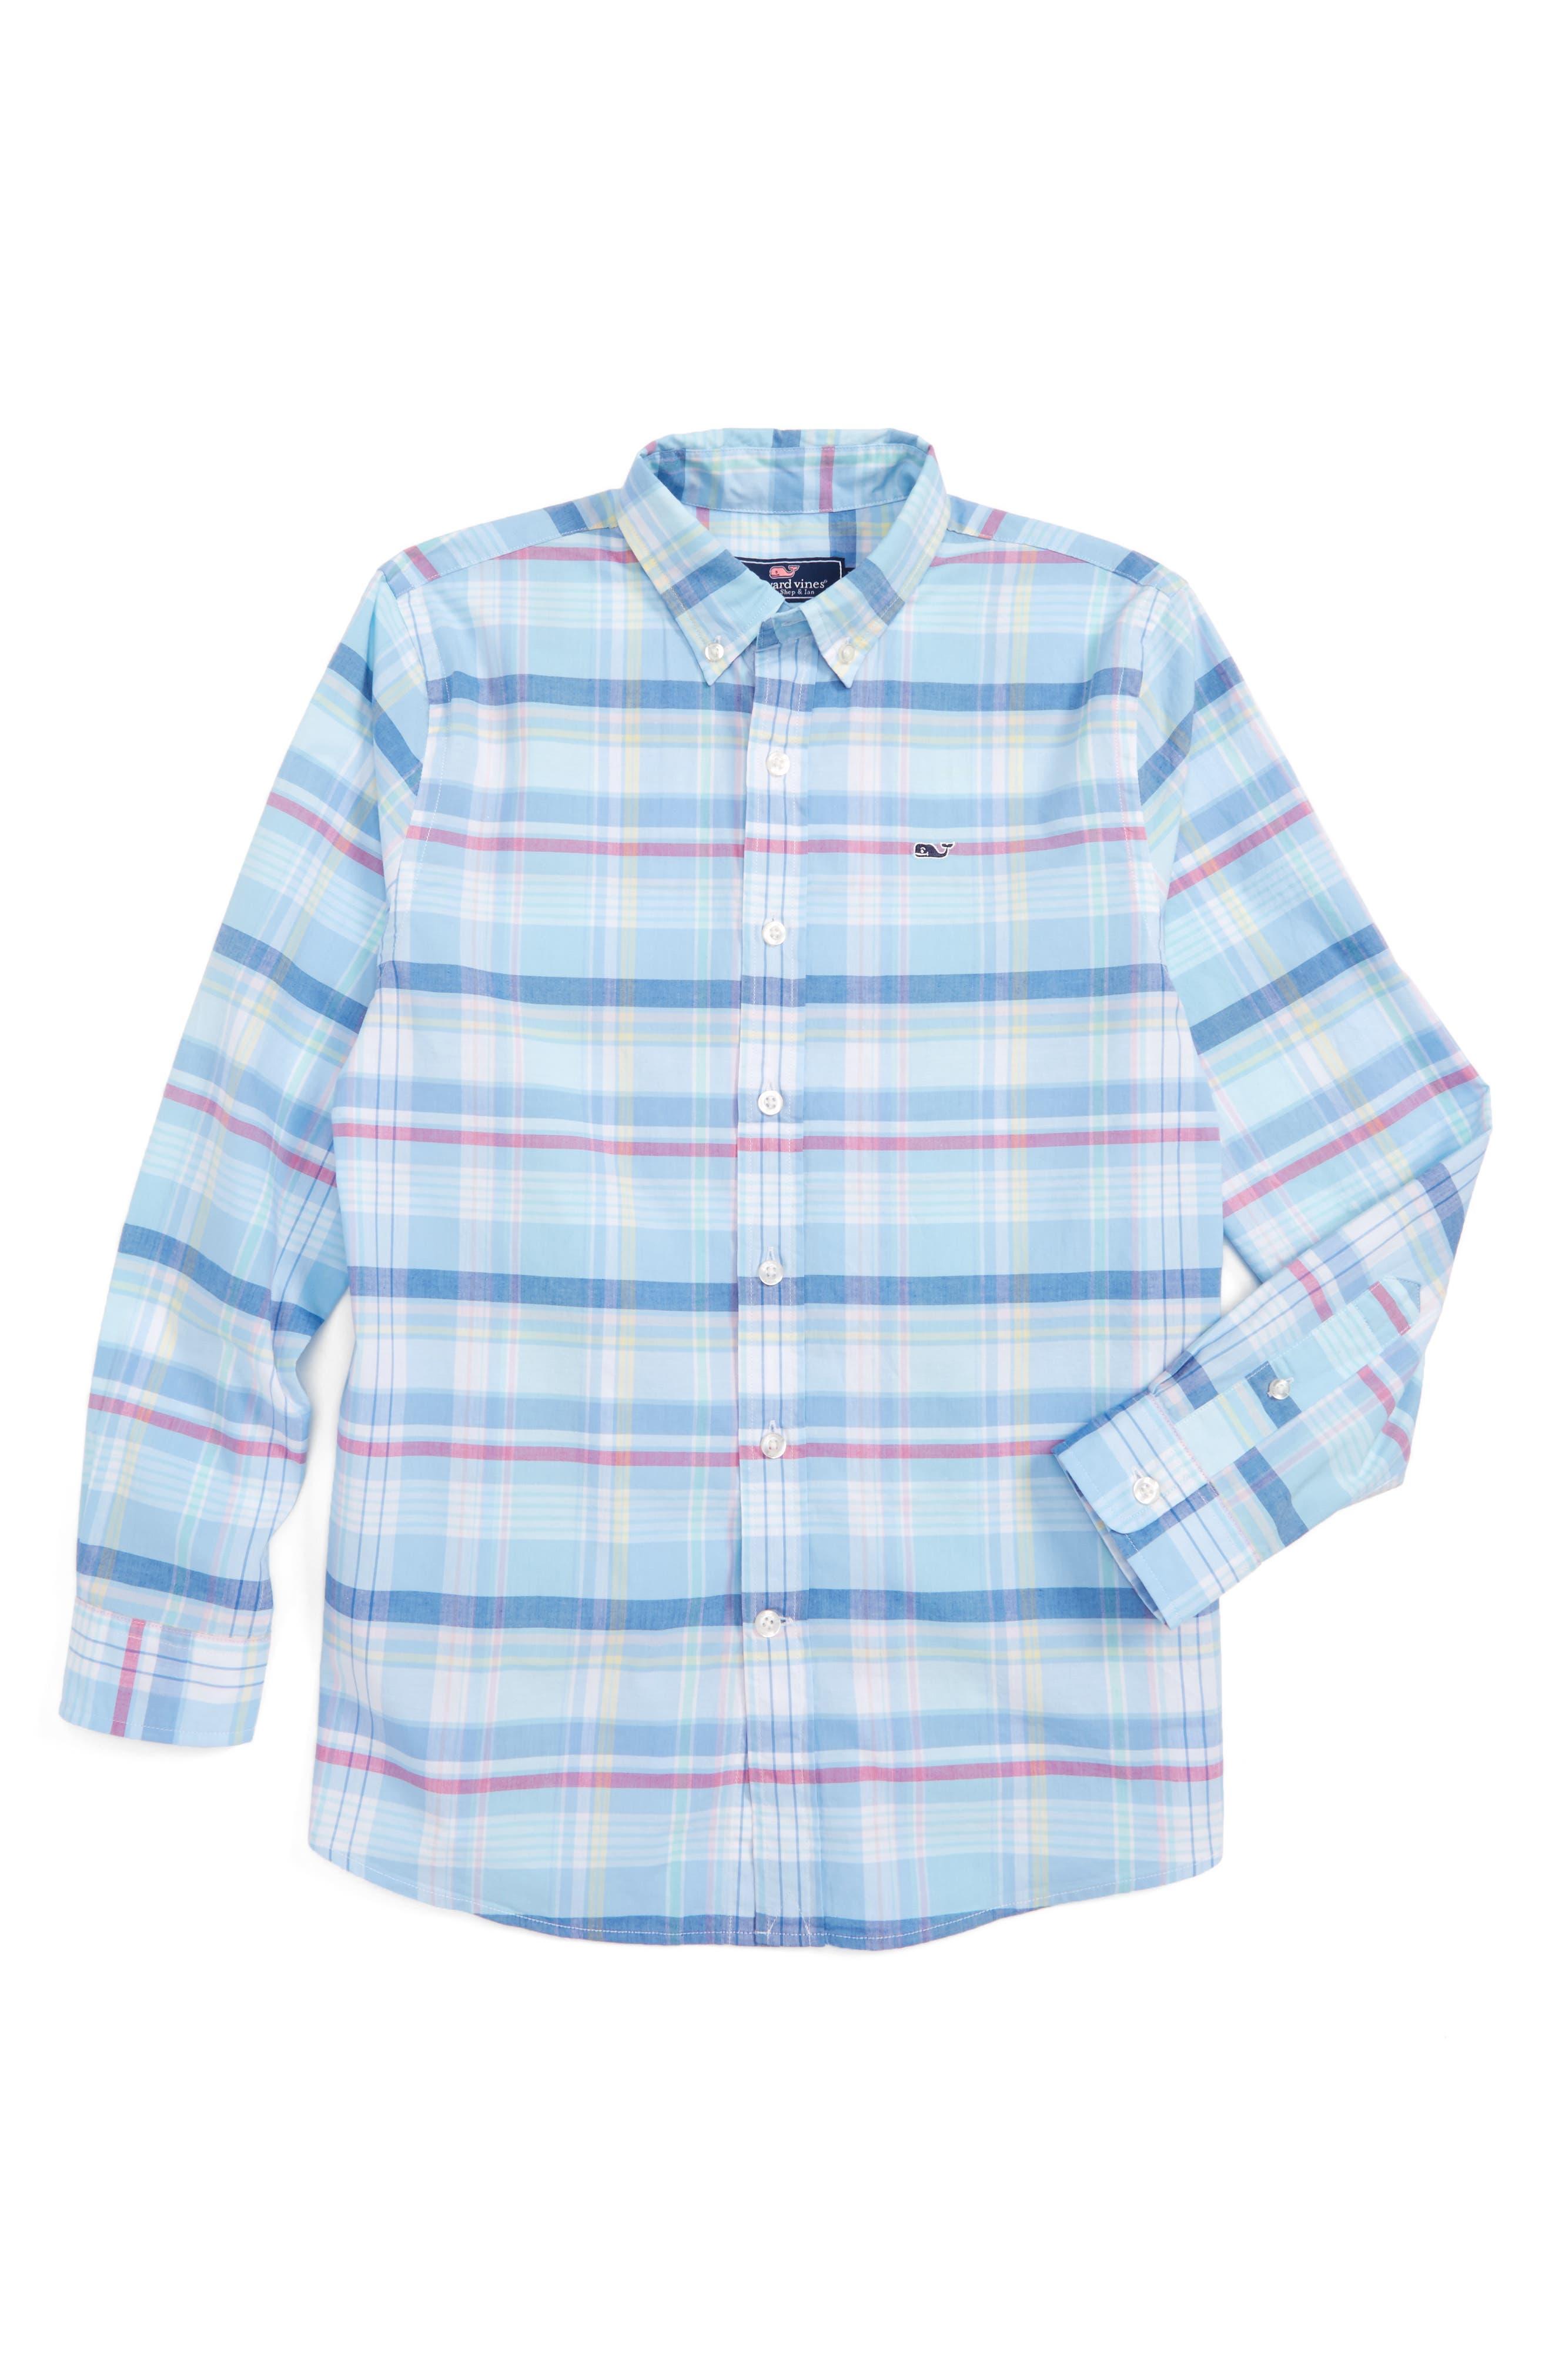 Vineyard Vines Cedar Point Plaid Whale Shirt (Toddler Boys, Little Boys & Big Boys)